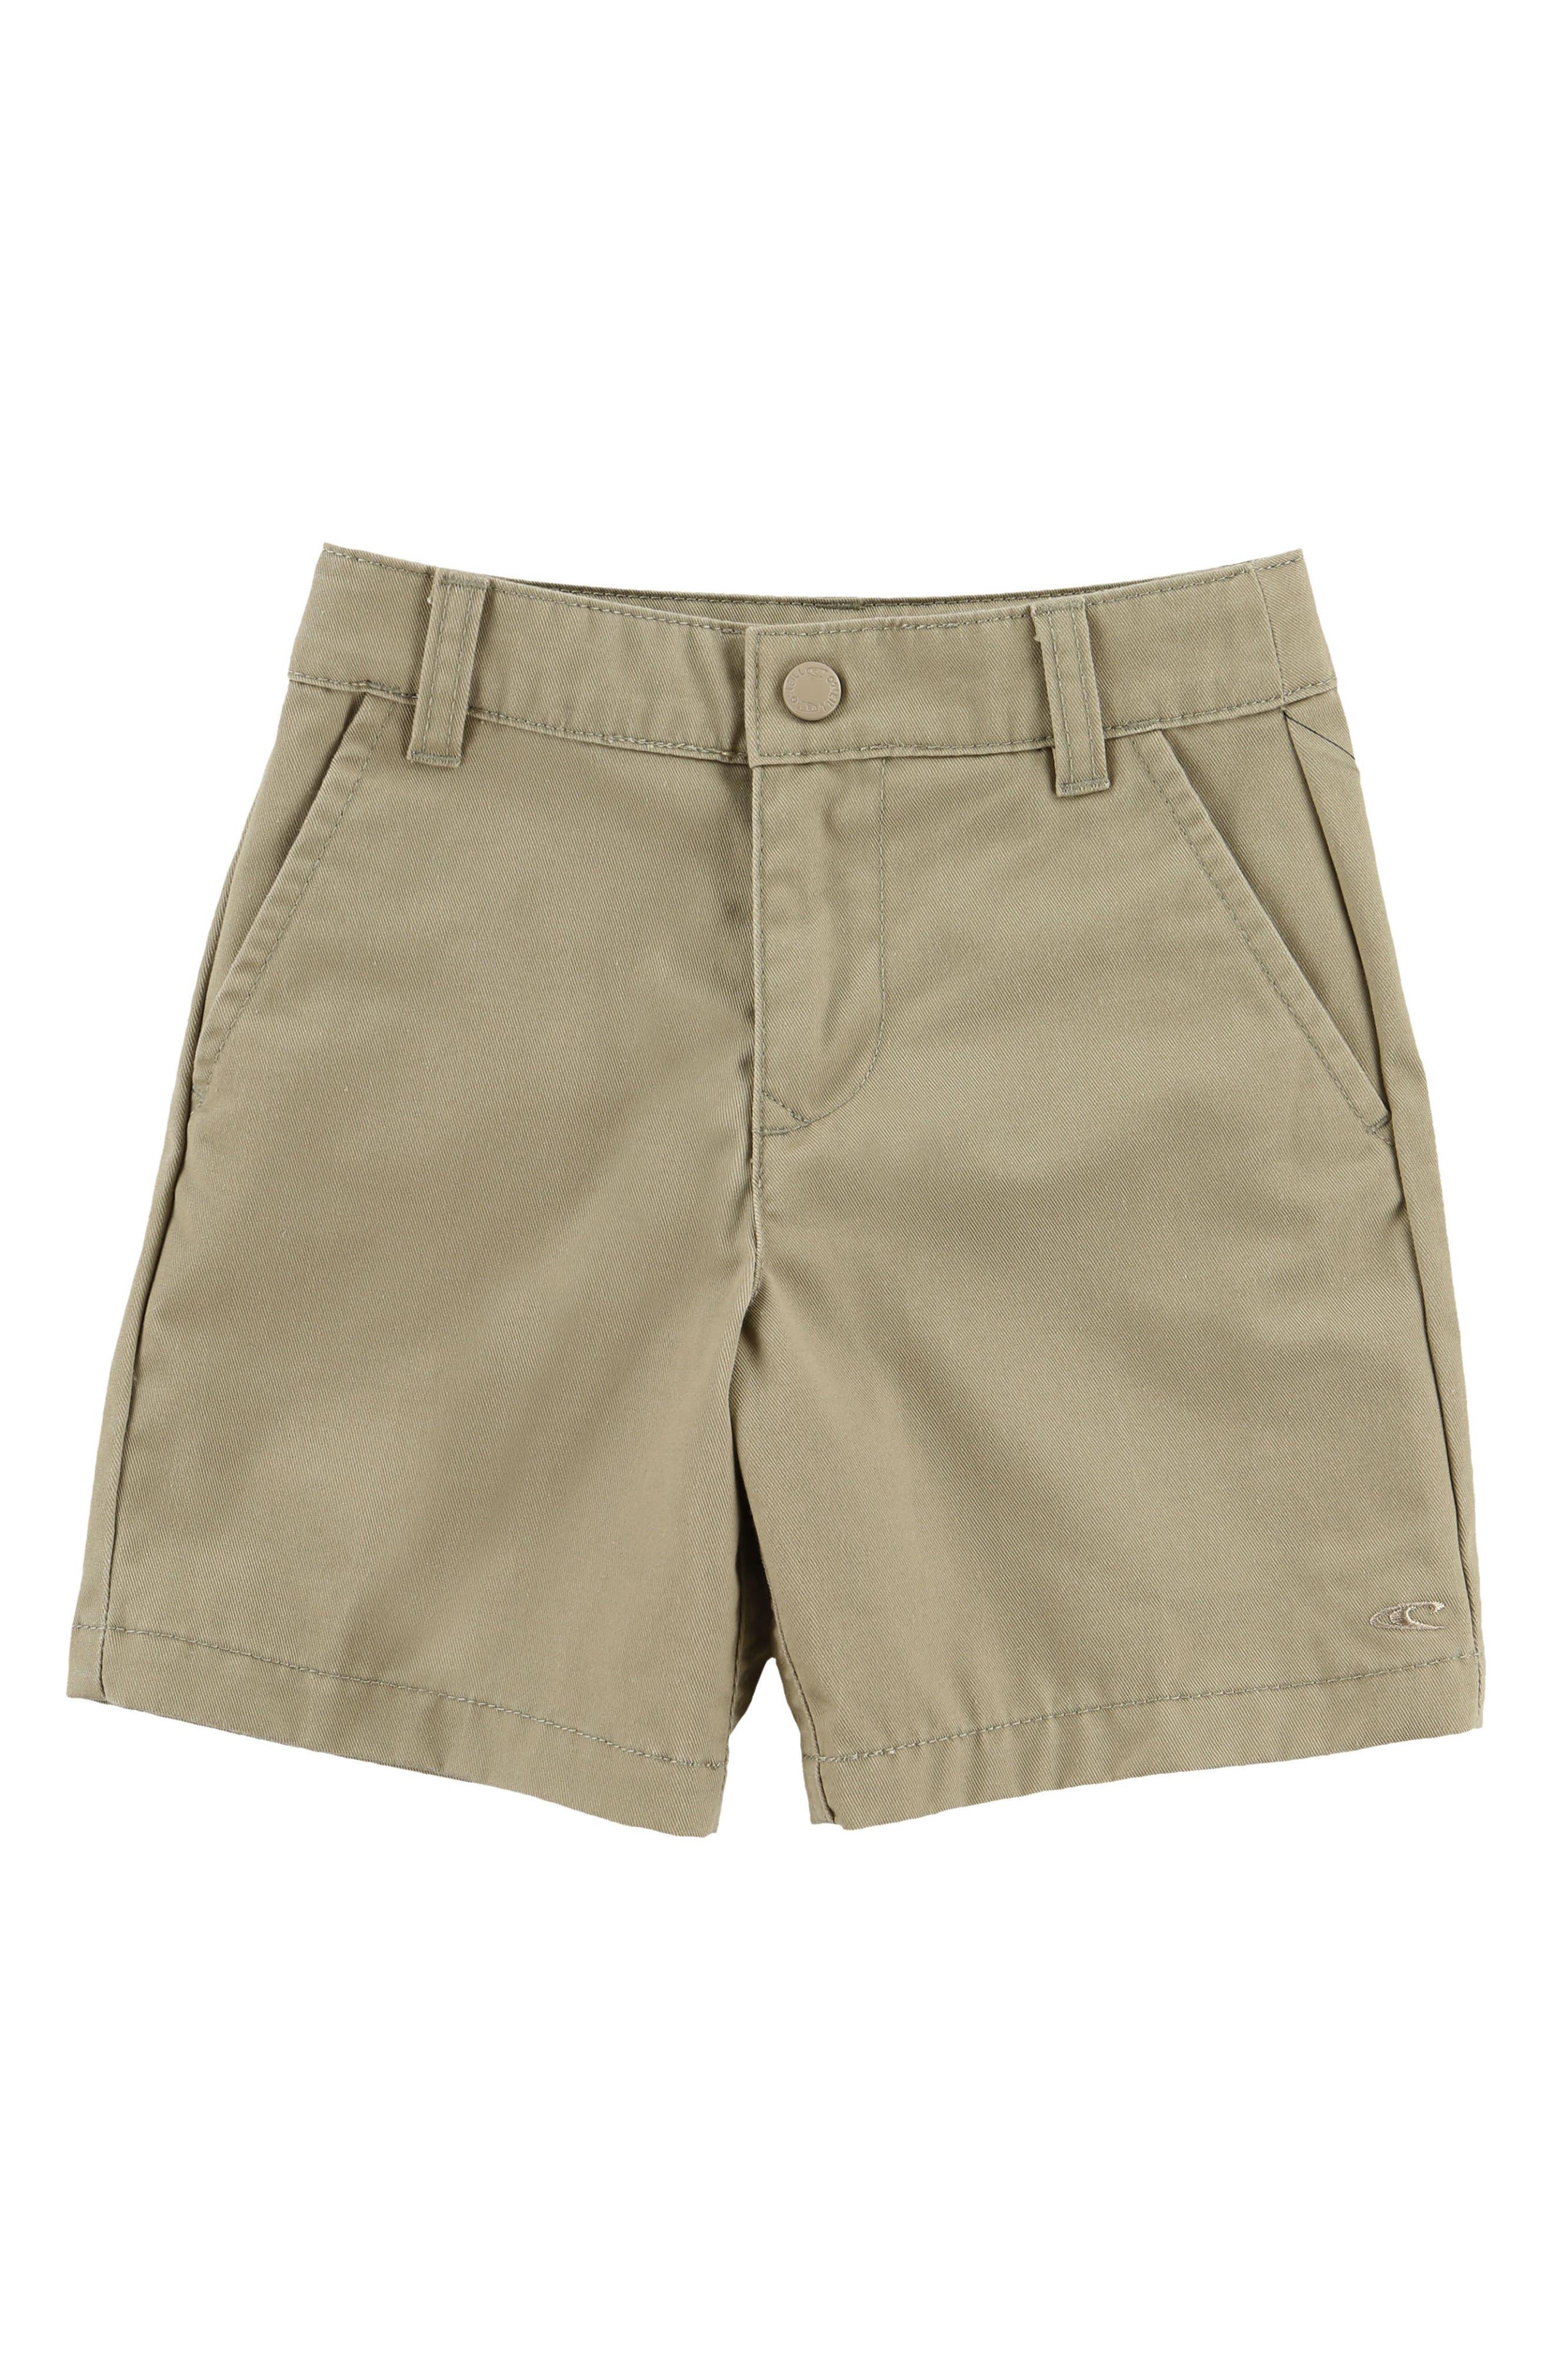 Main Image - O'Neill Contact Twill Walking Shorts (Toddler Boys)